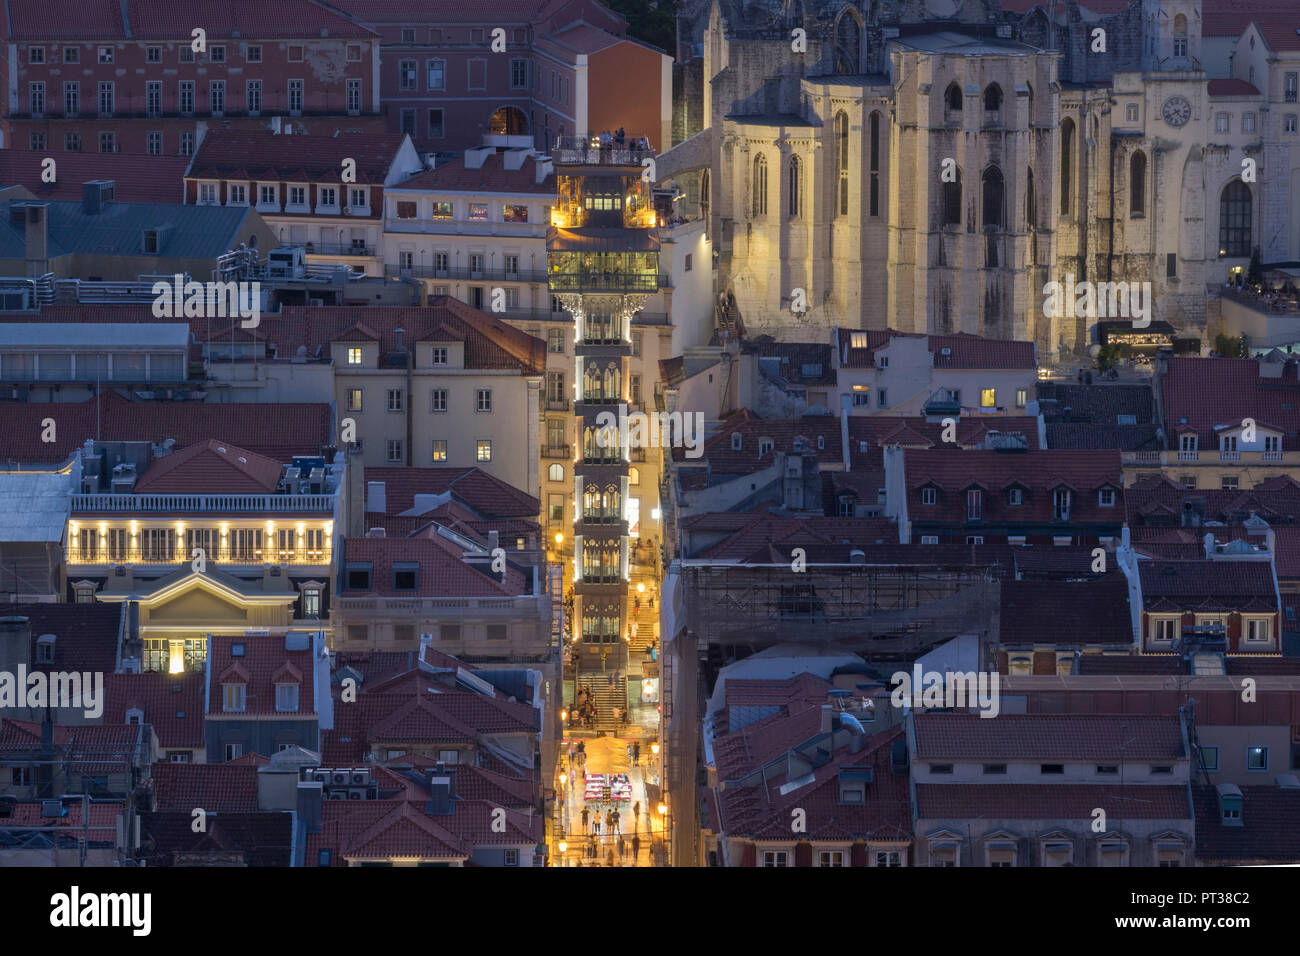 Portugal, Lisbon, Elevador de Santa Justa and ruin of Convento do Carmo, night shot from Castelo de S. Jorge Stock Photo